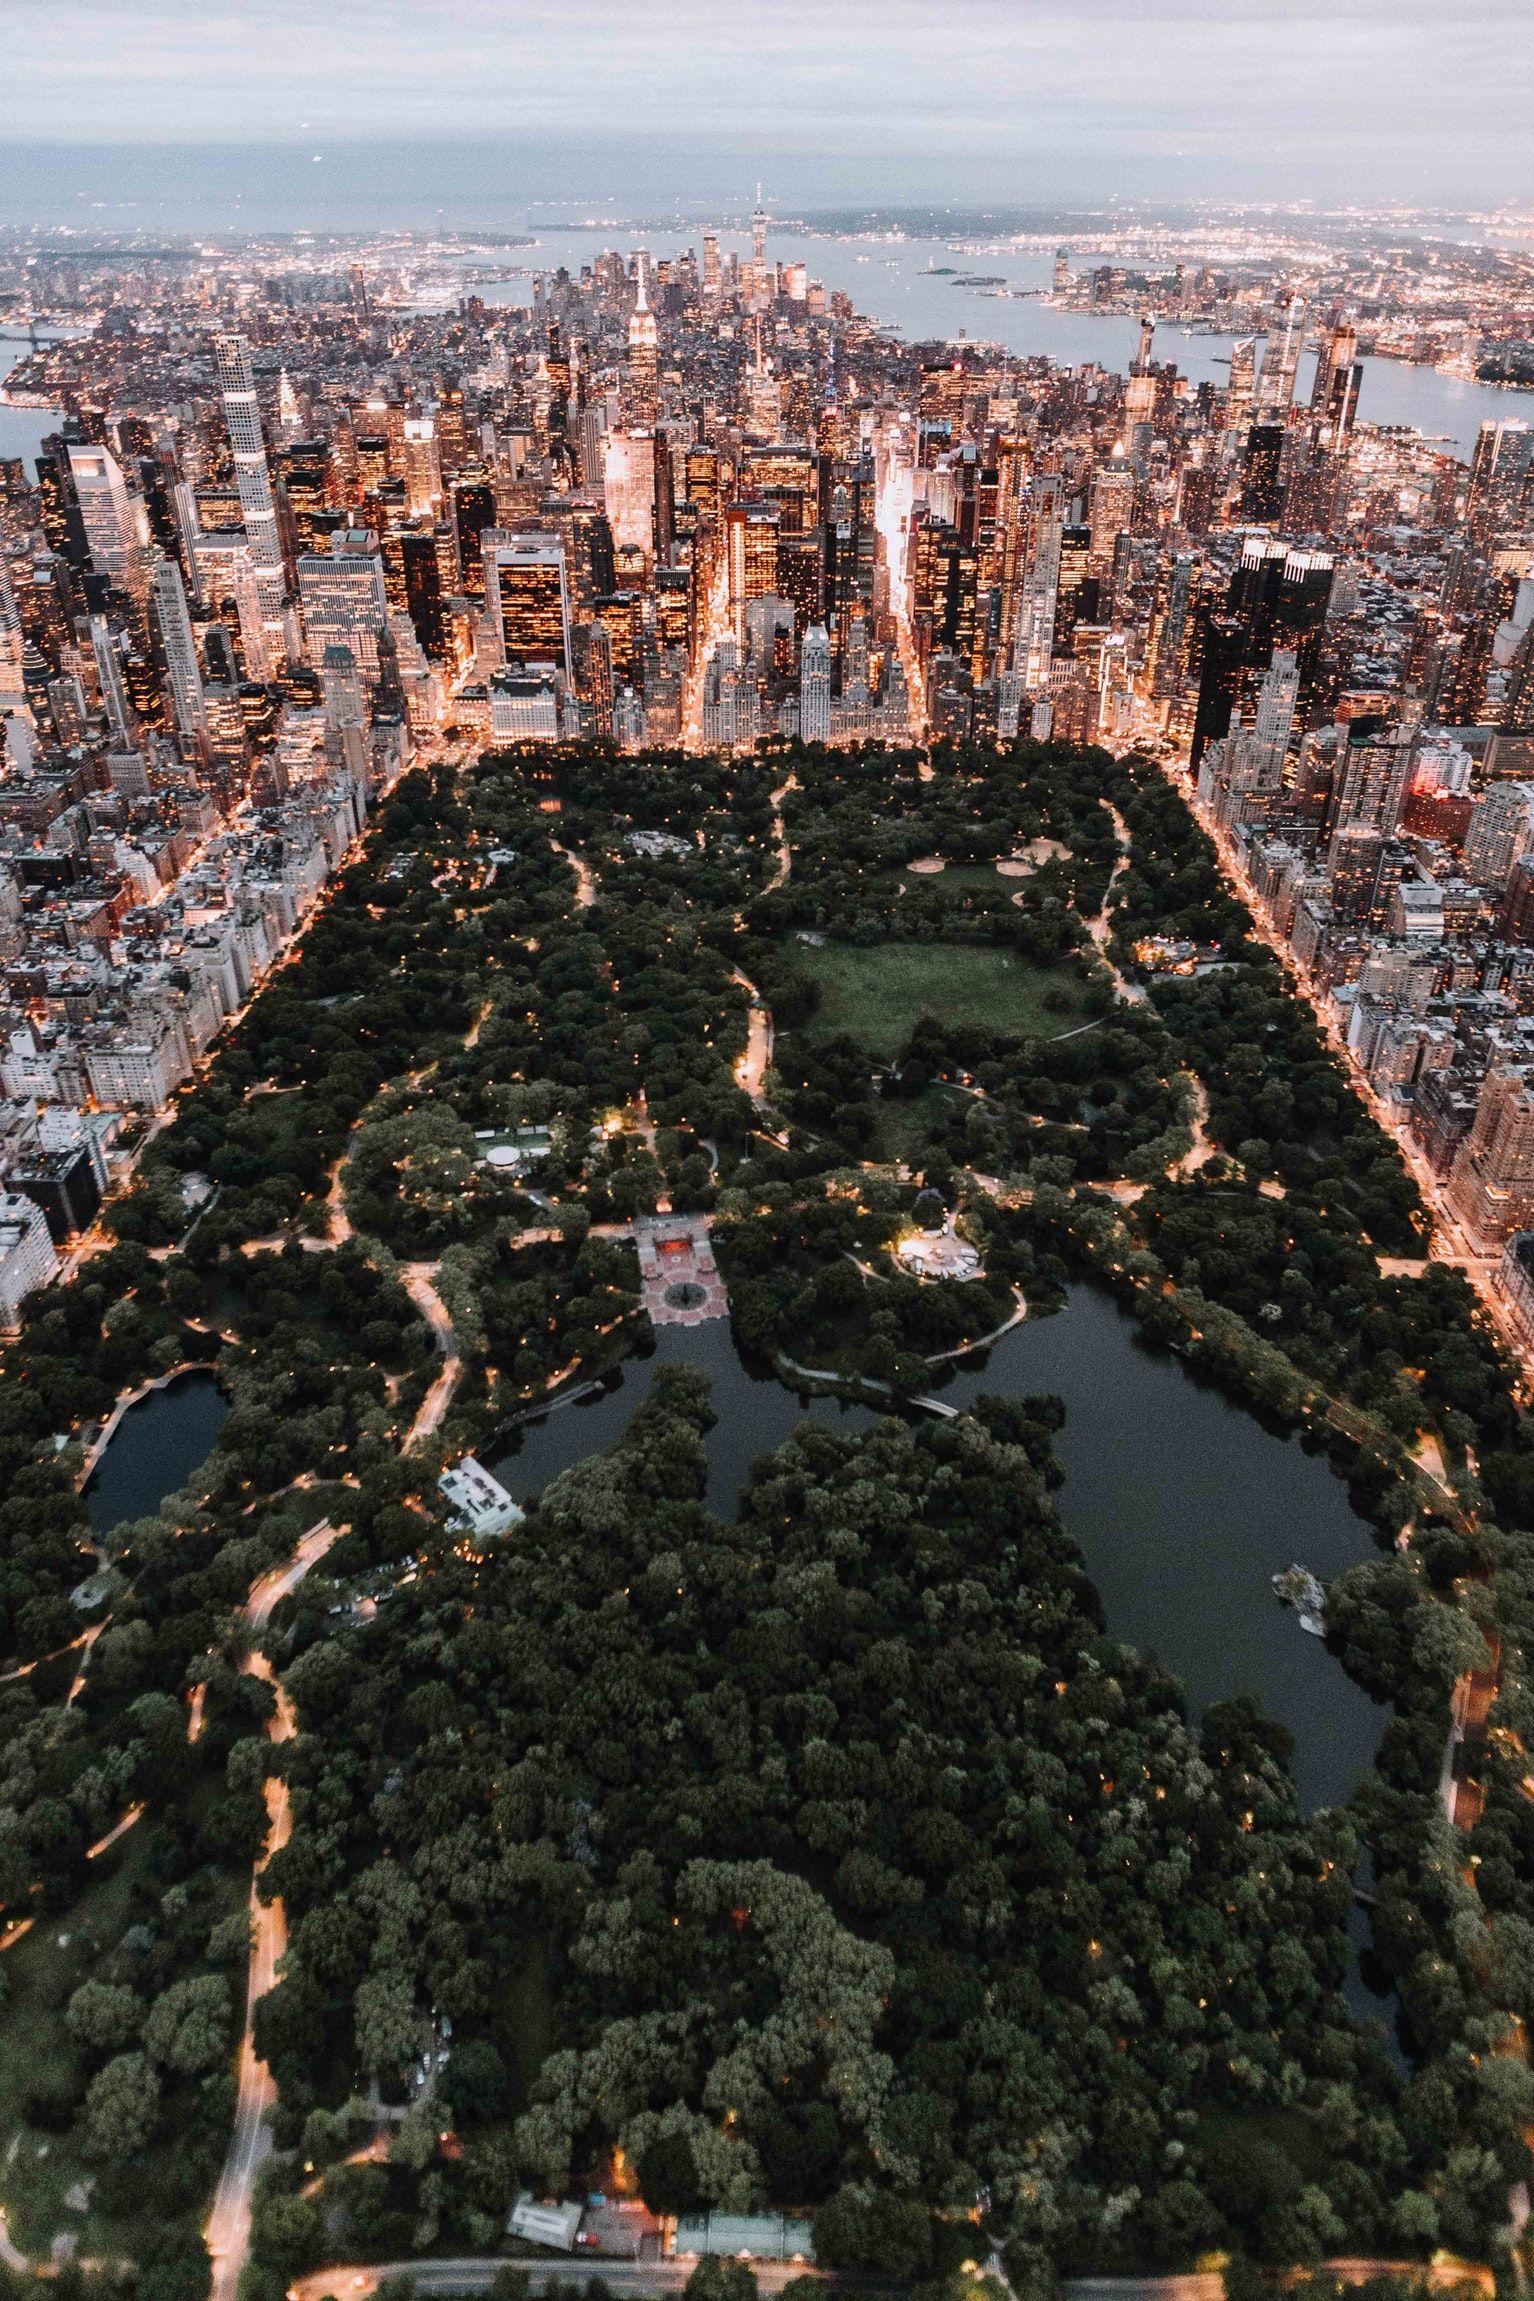 New York City Photo By Trent